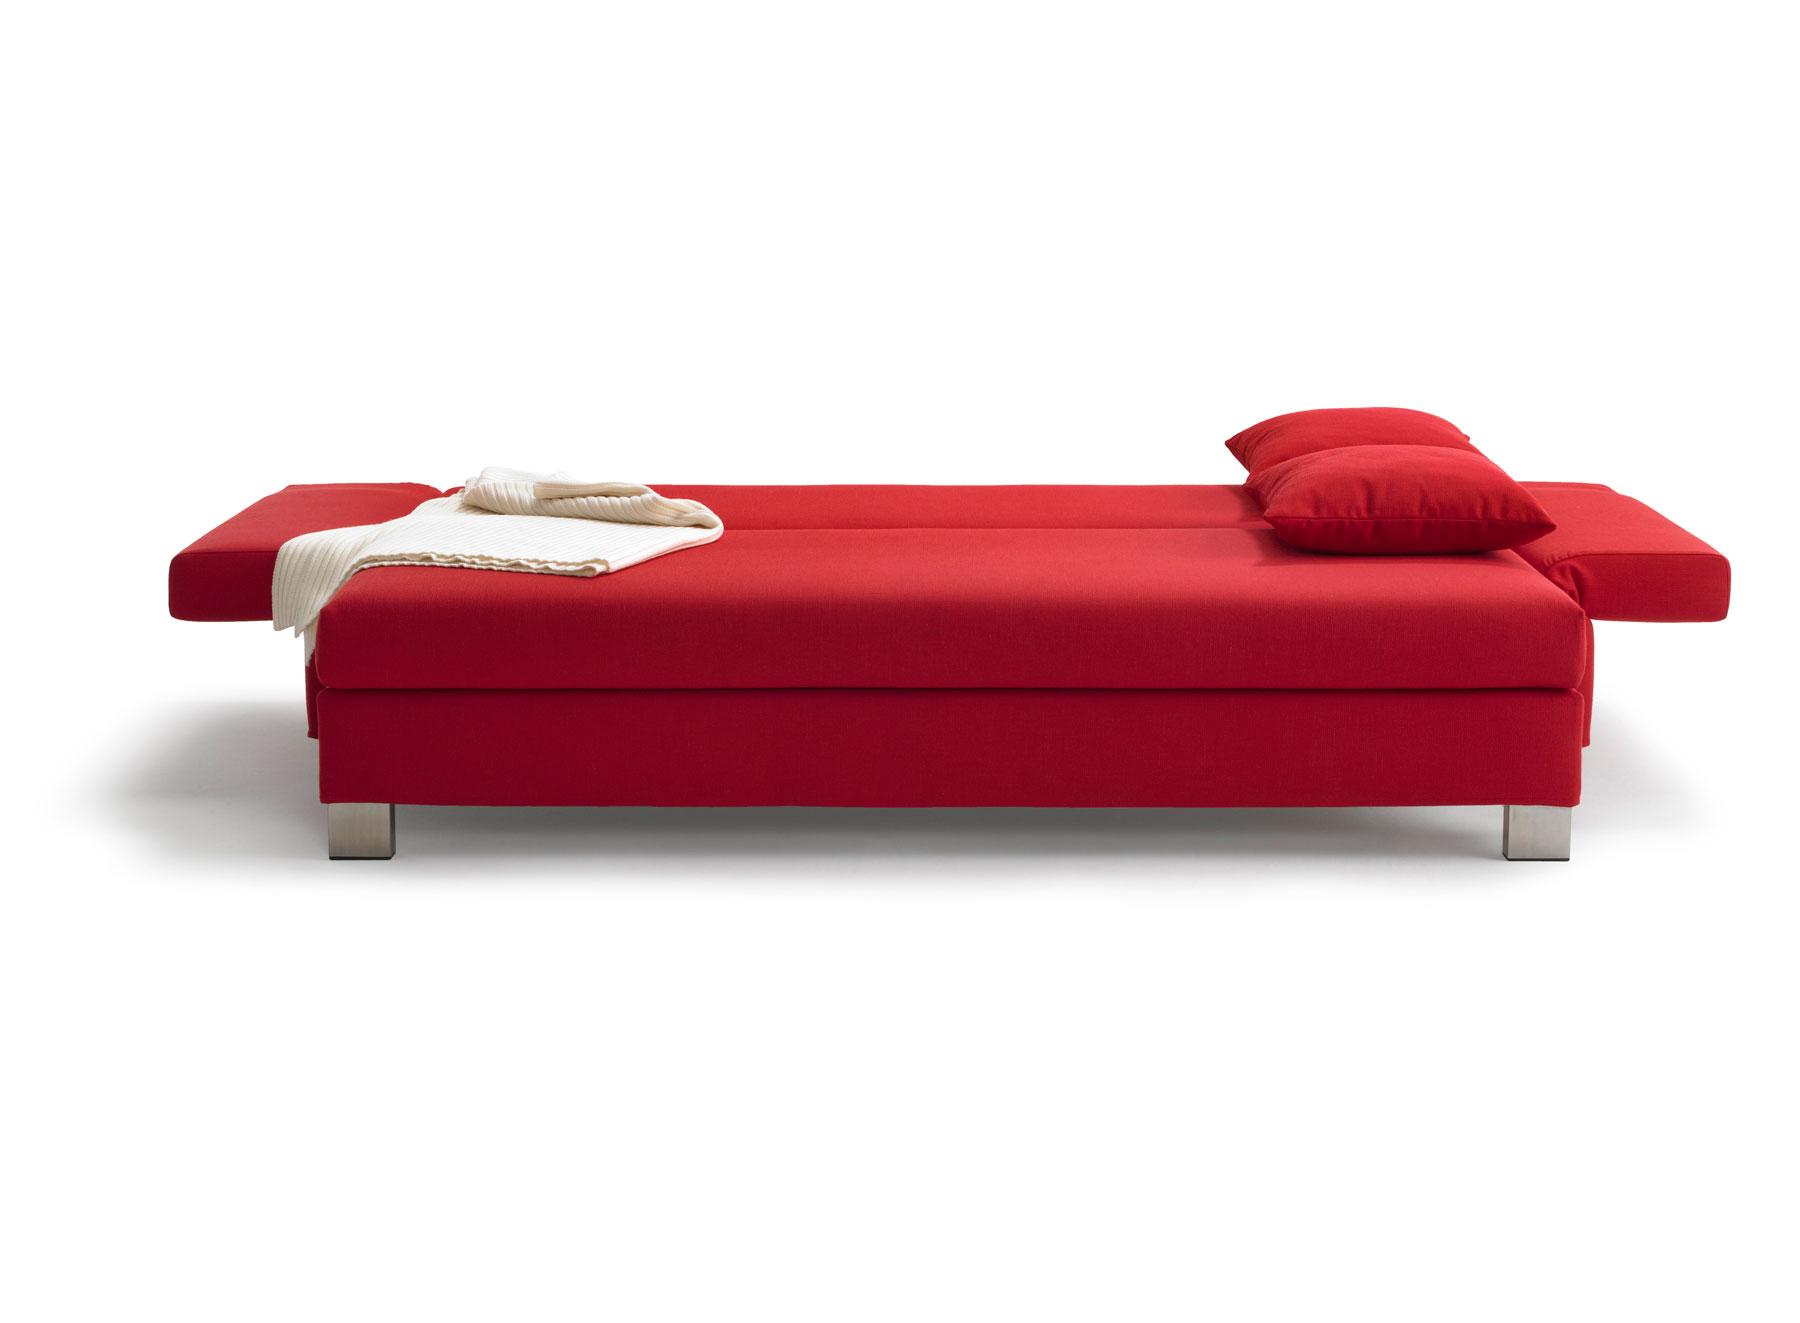 Full Size of Goodlife Sofa Malaysia Good Life Signet Couch Furniture Love Amazon 3 Sitzer Grau Impressionen Schlaf Bezug Ecksofa Boxspring Mit Schlaffunktion Barock Sofa Goodlife Sofa